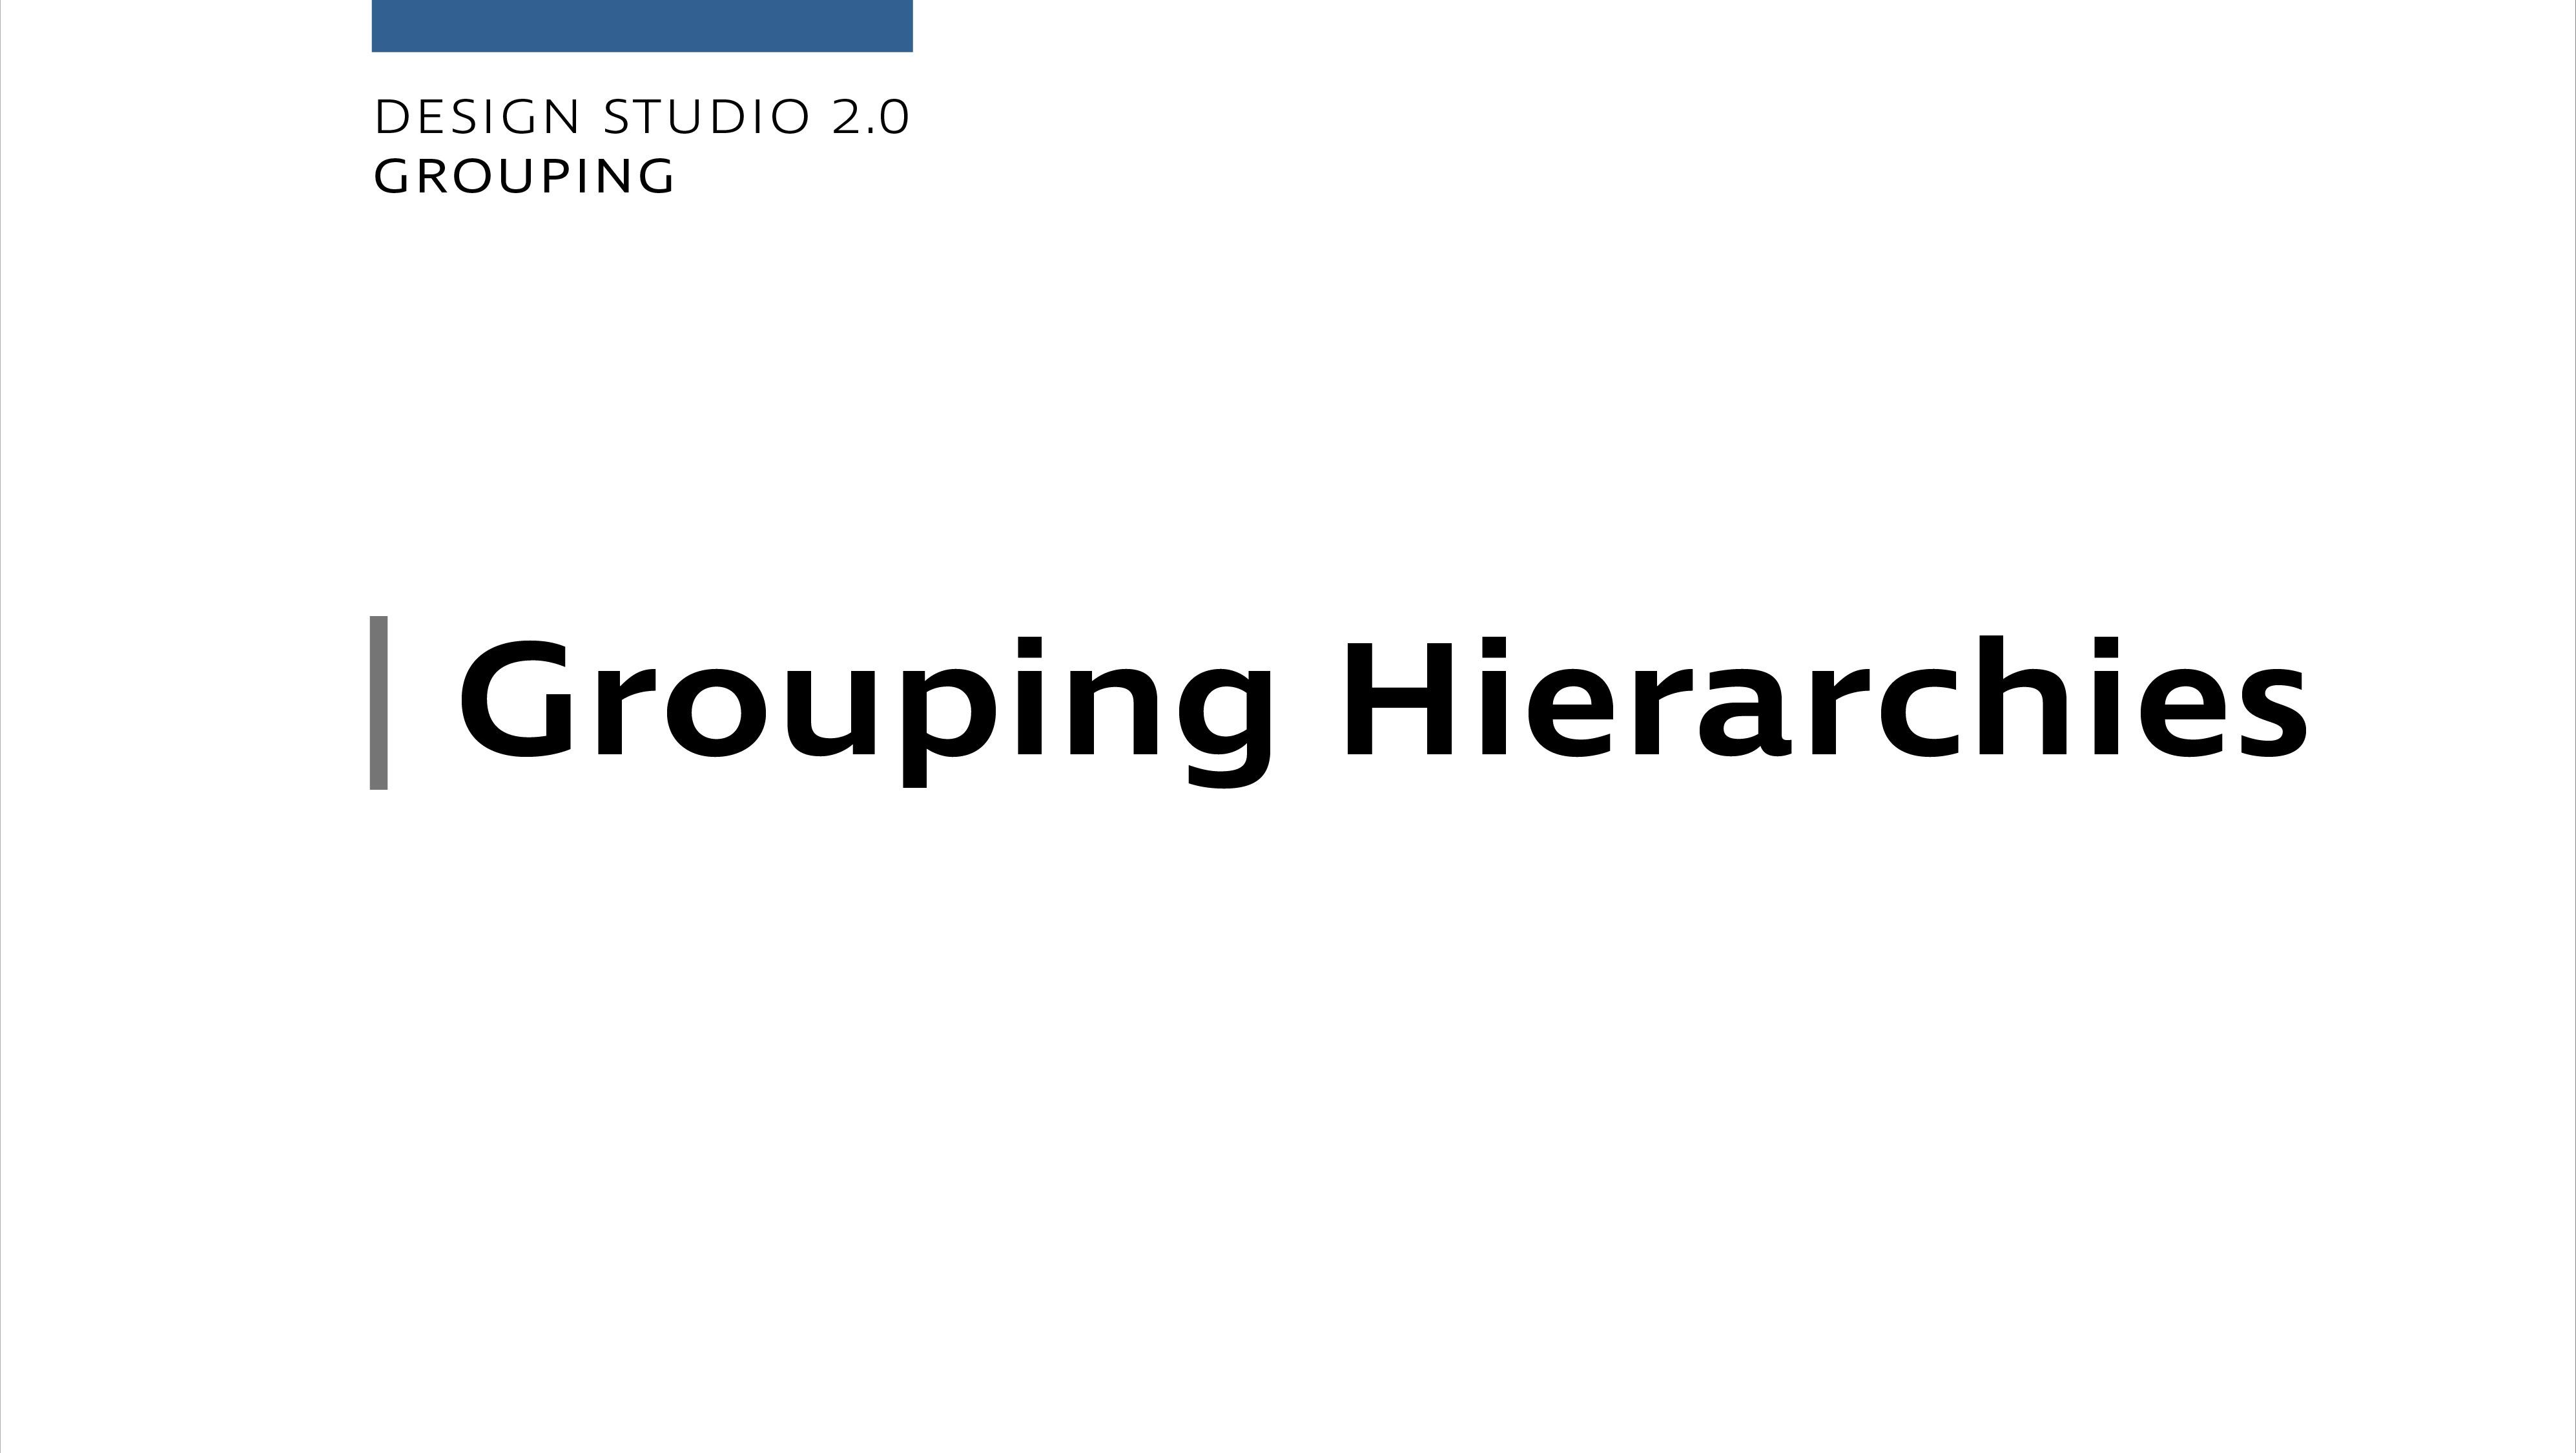 Design Studio 2.0 - Grouping Hierarchies